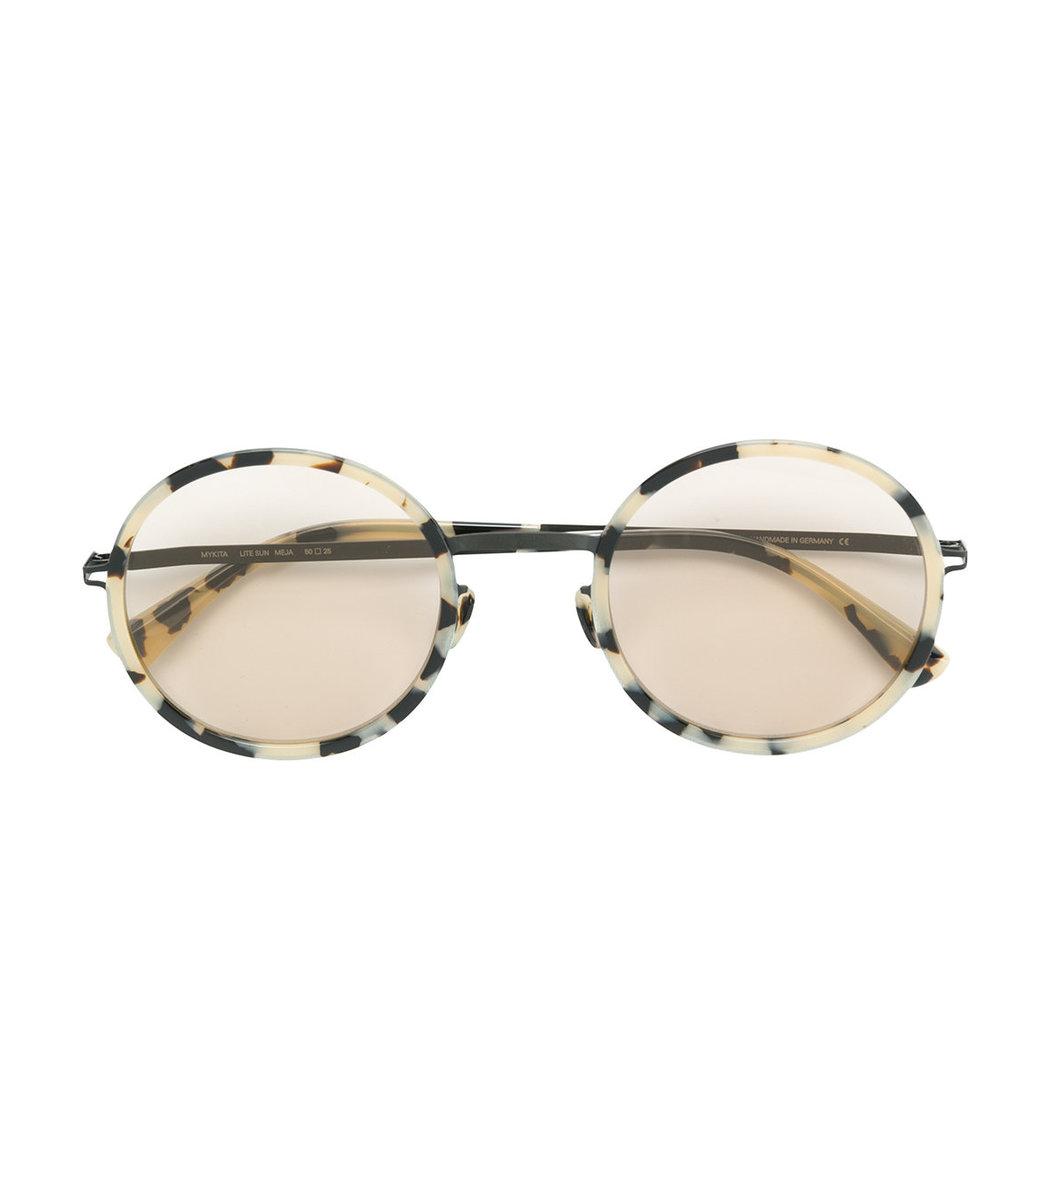 Sunglasses Frame Mykita Brown Tinted Round Lenses Meja qtOwT7